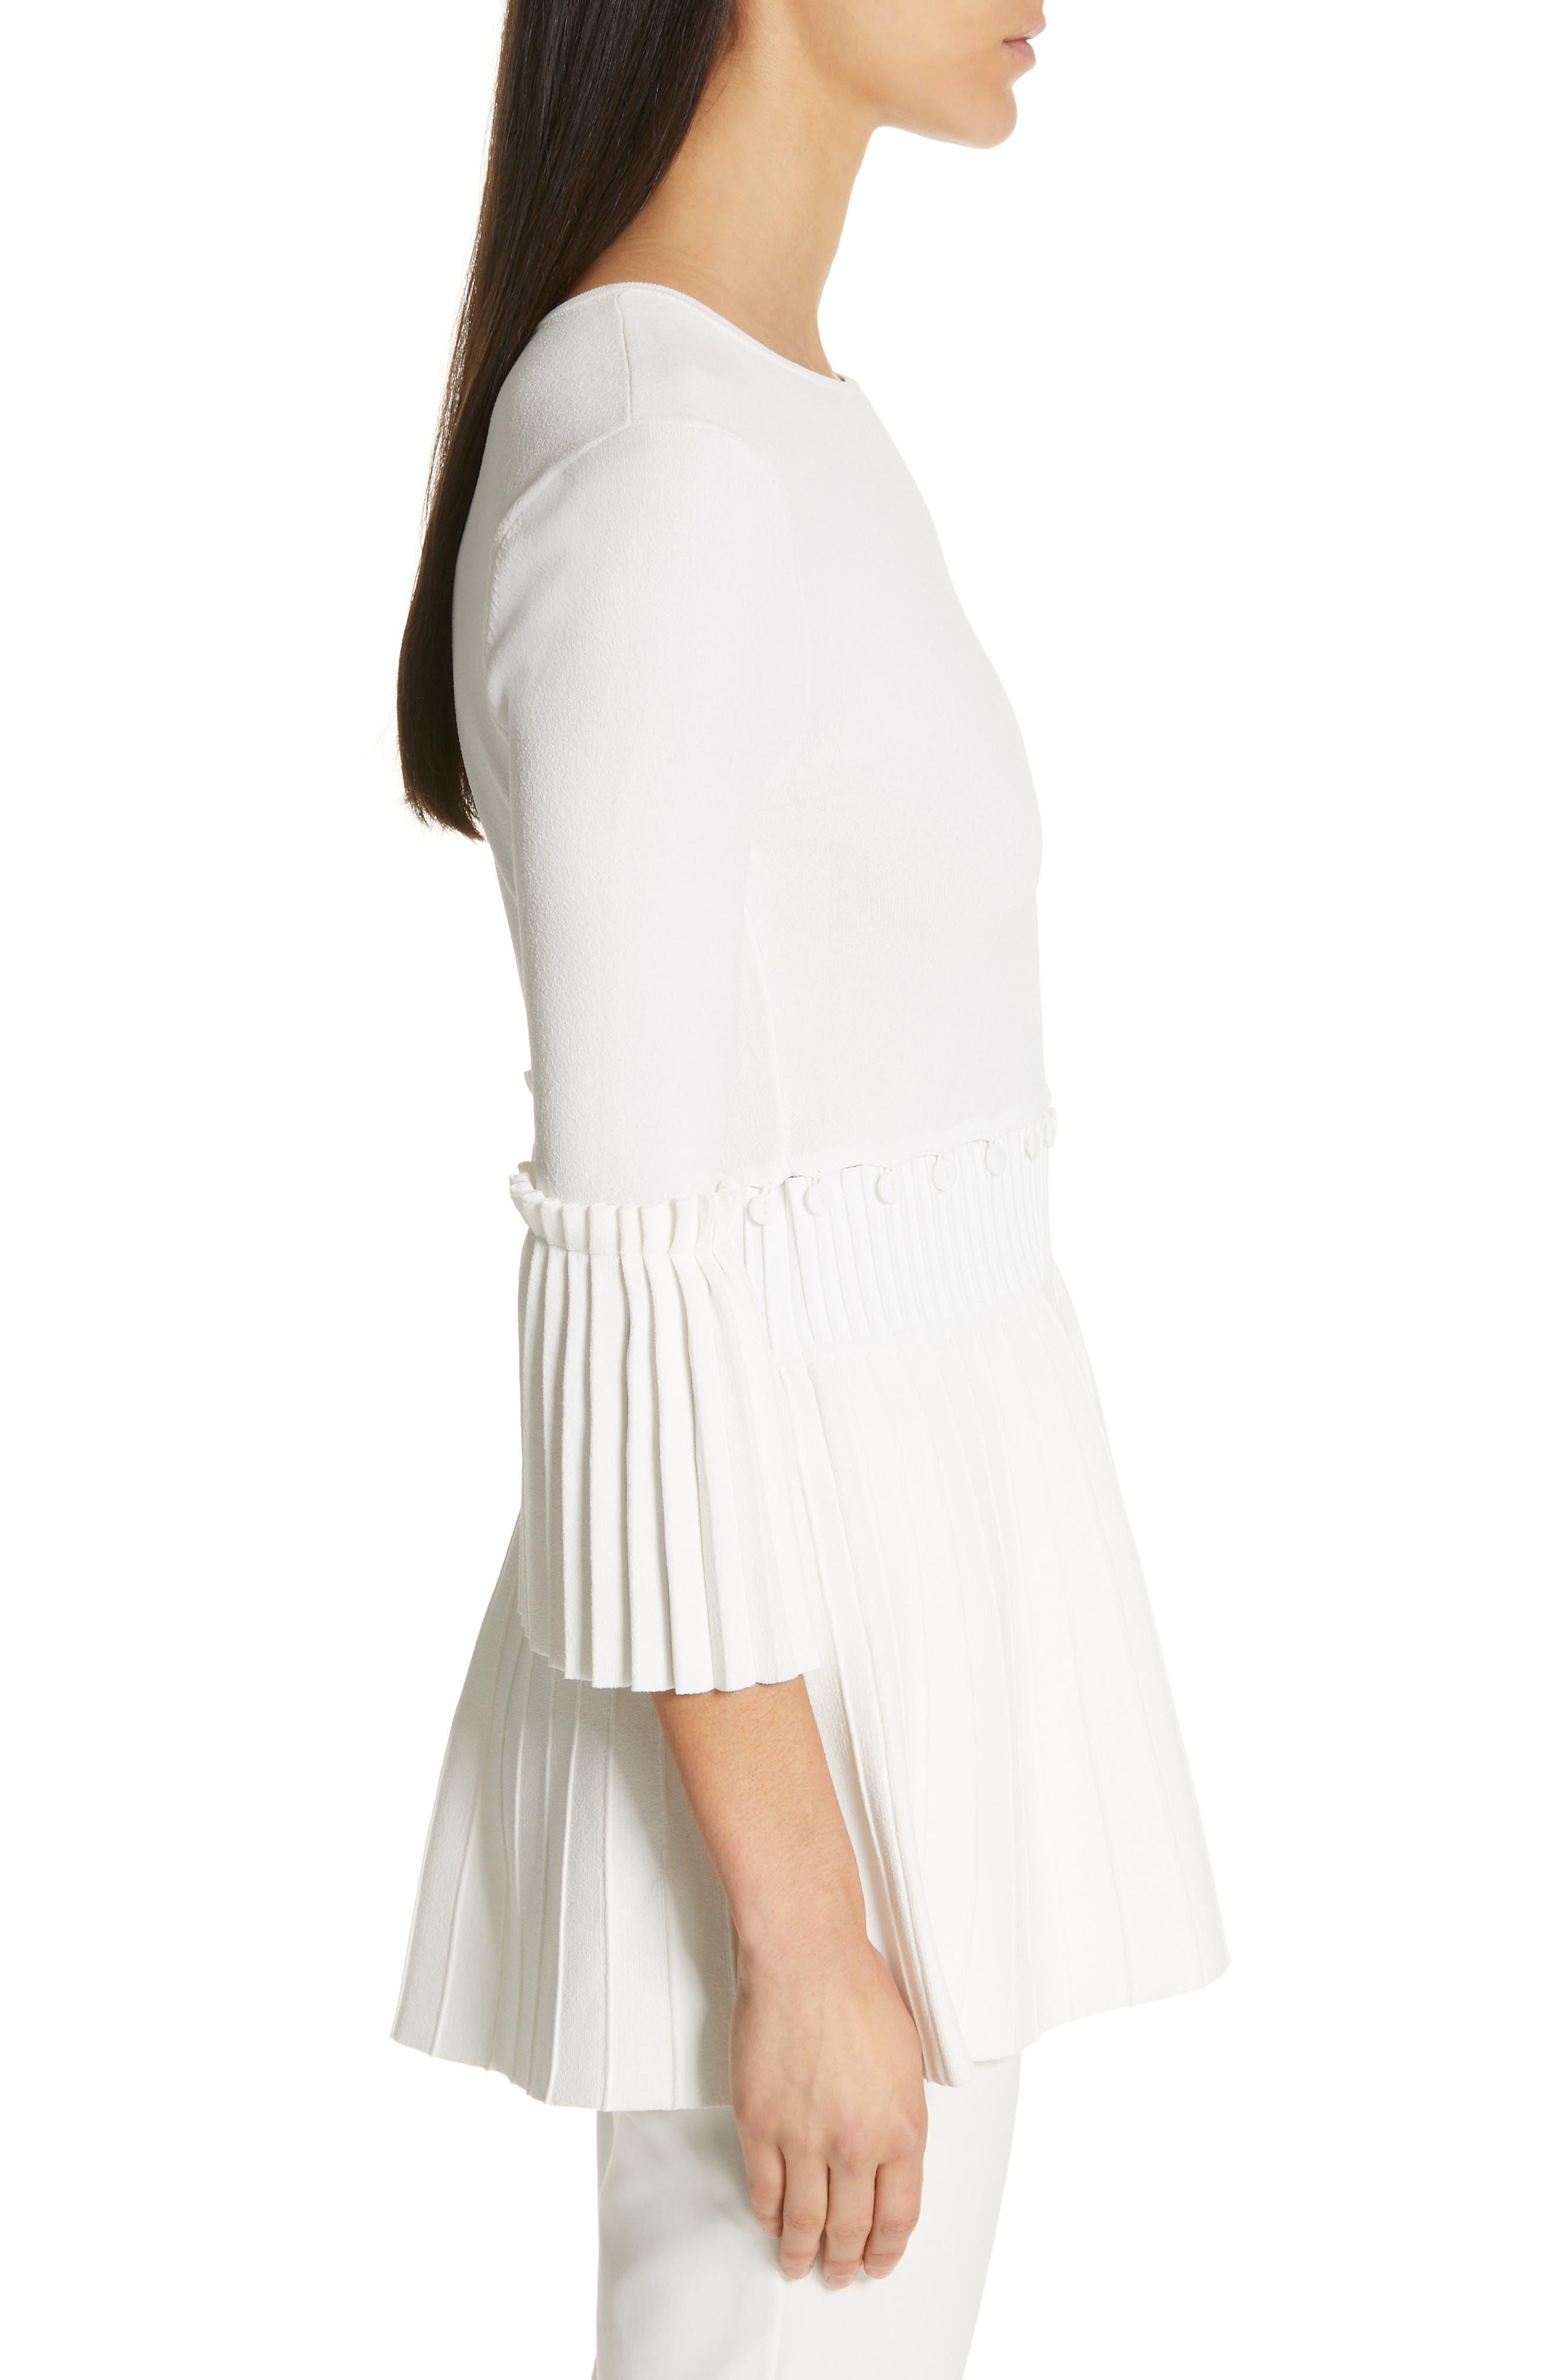 LELA ROSE,                             Pleated Knit Top,                             Alternate thumbnail 3, color,                             WHITE